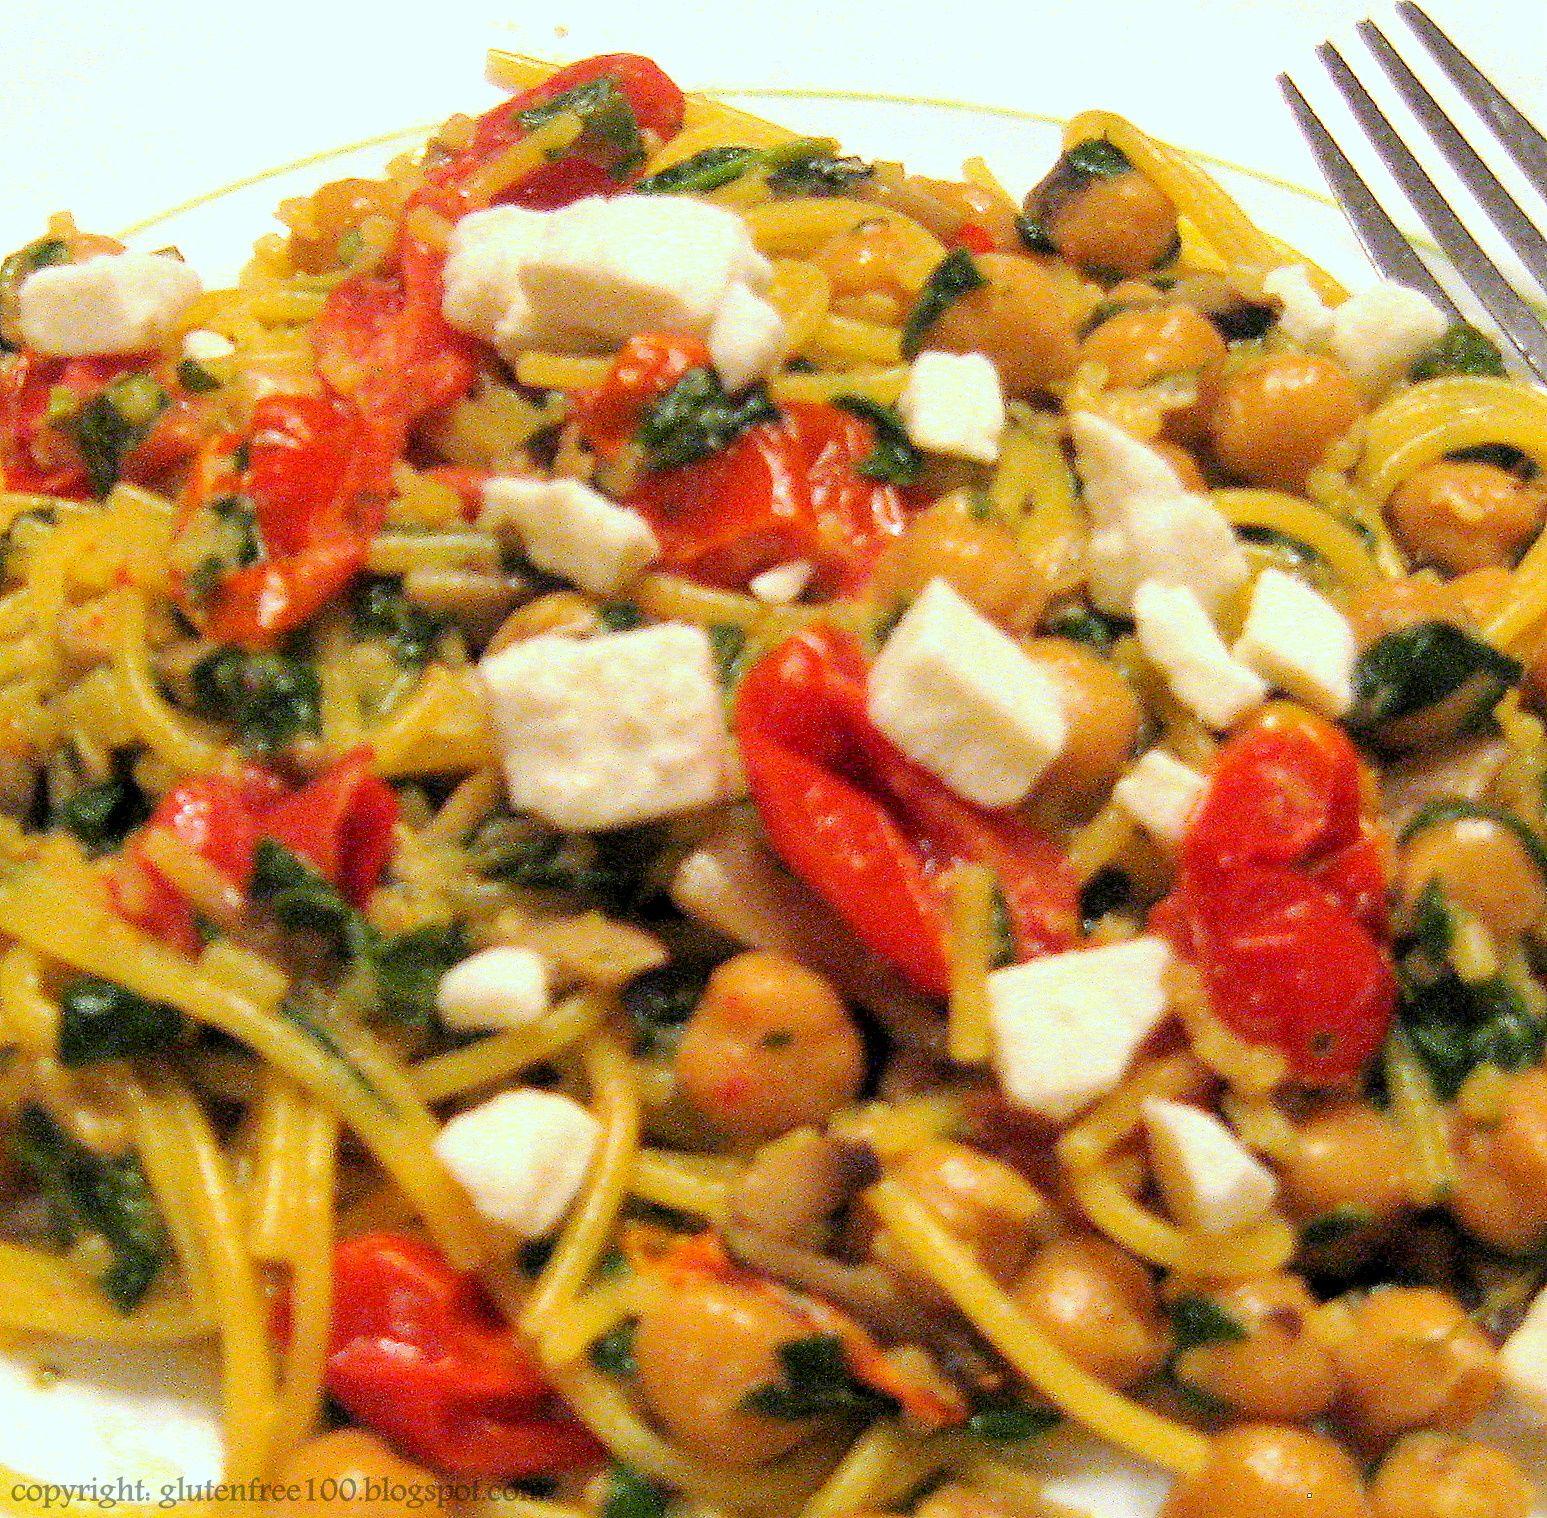 Gluten free spaghetti with chickpeas in a creamy white